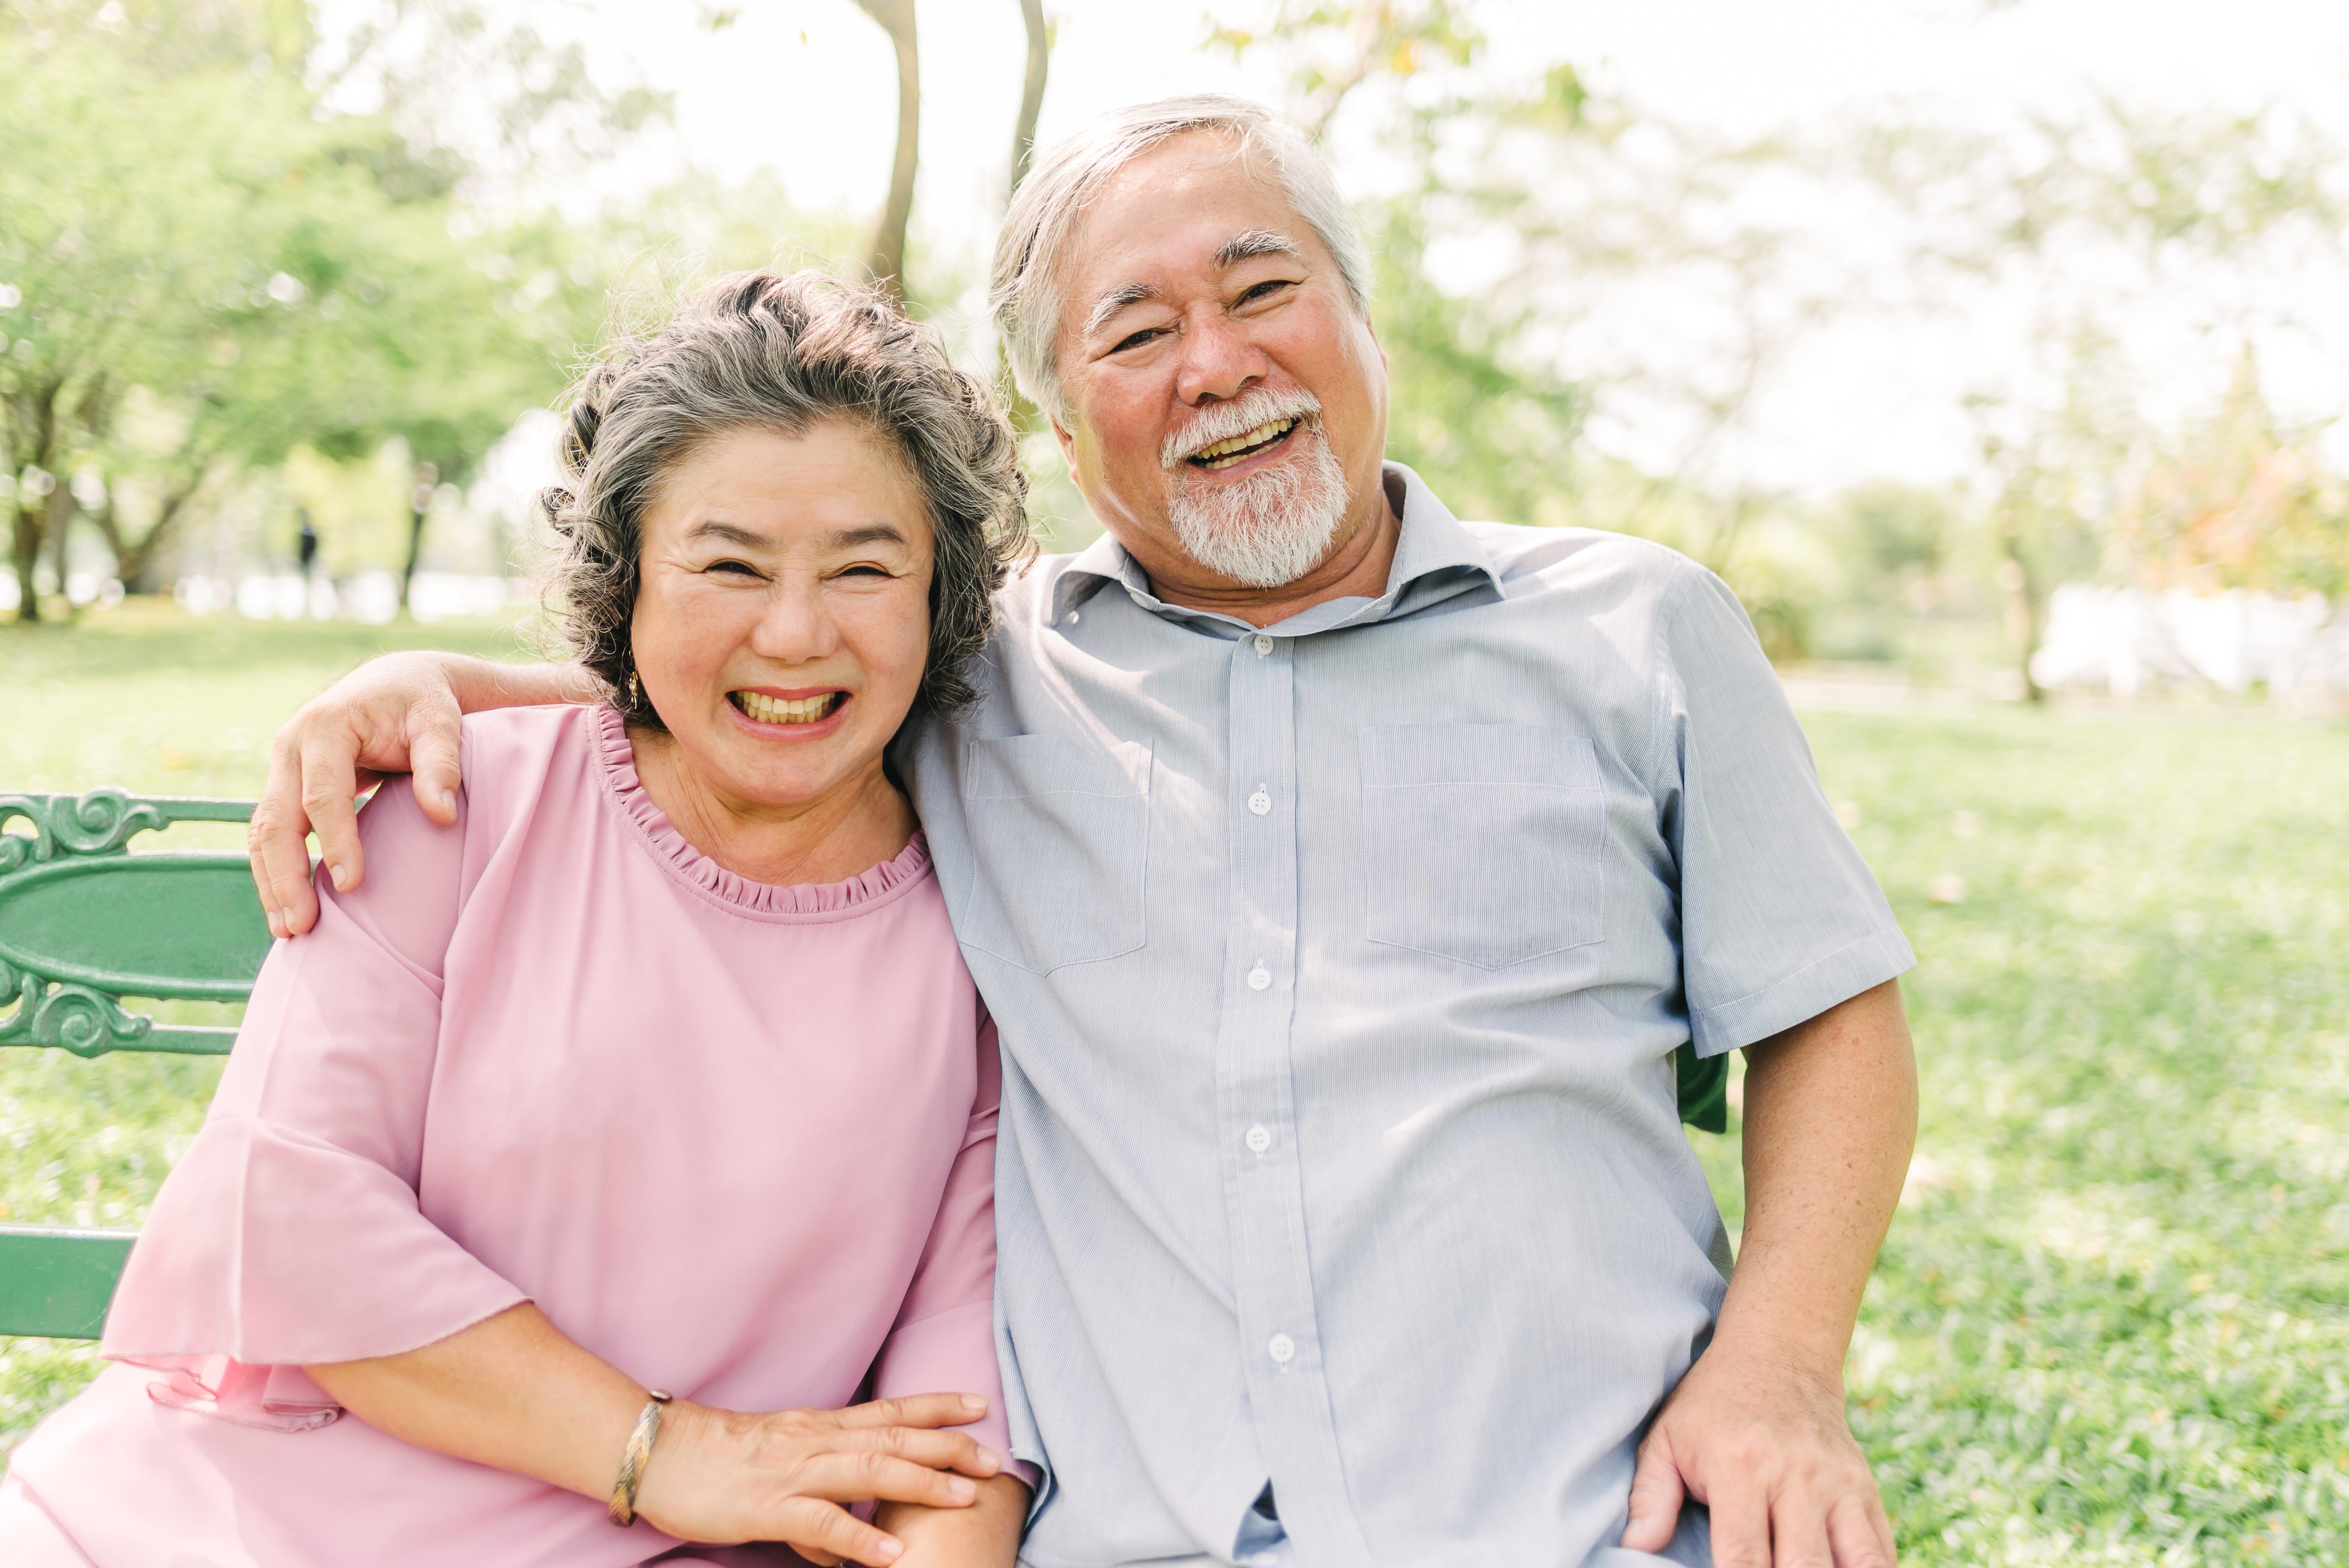 Patients smiling image